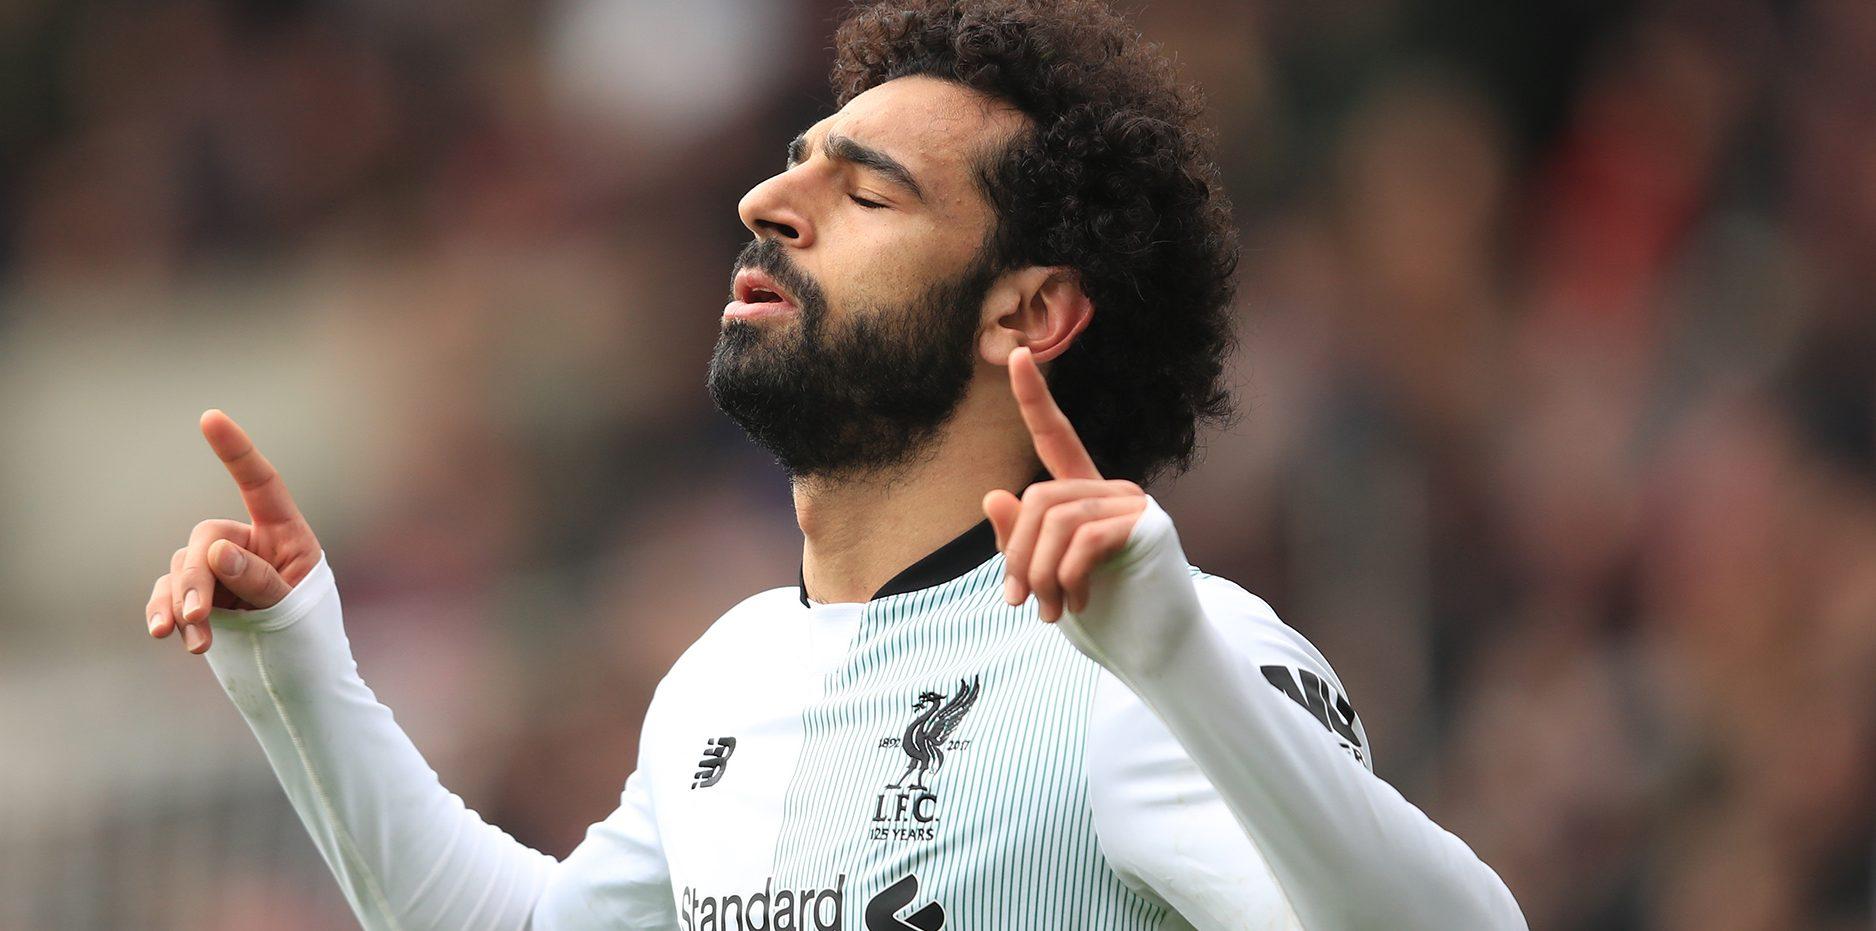 Late strike by Salah gives Liverpool 2-1 win at Crystal Palace